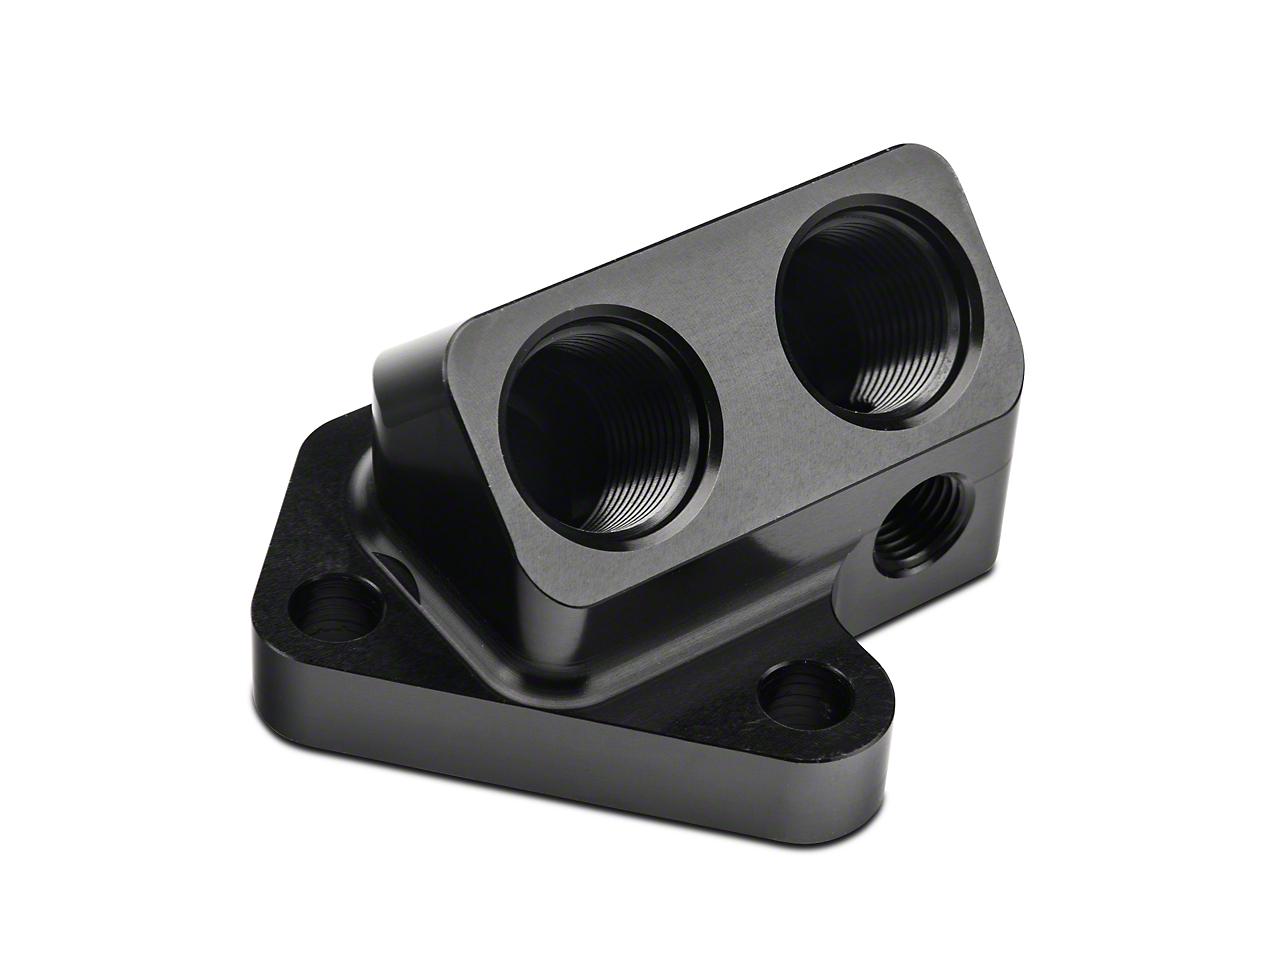 Moroso Remote Oil Filter Adaptor (11-14 GT)